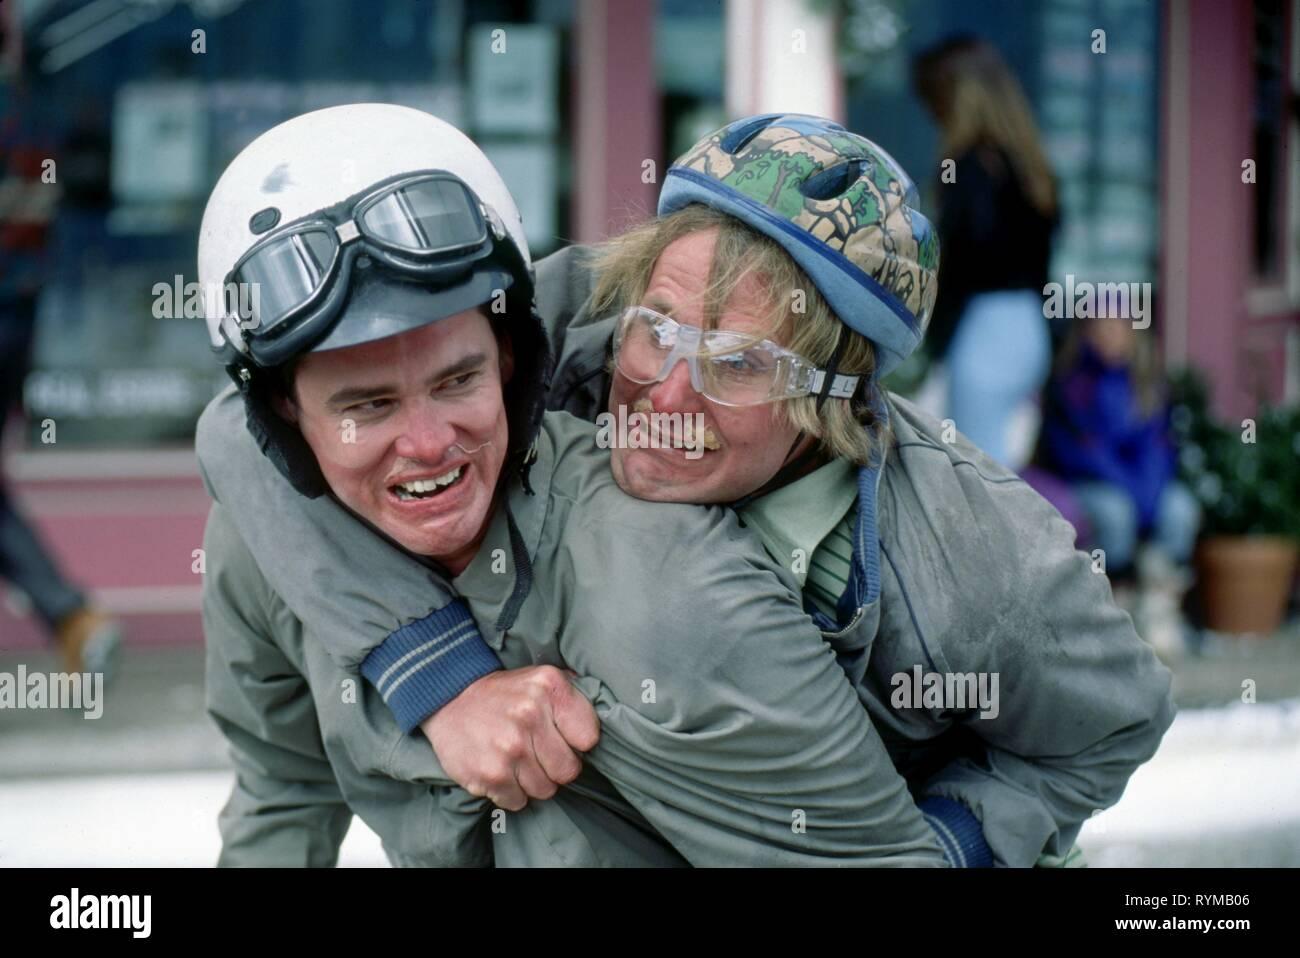 Carrey Daniels Dumb And Dumber 1994 Stock Photo Alamy